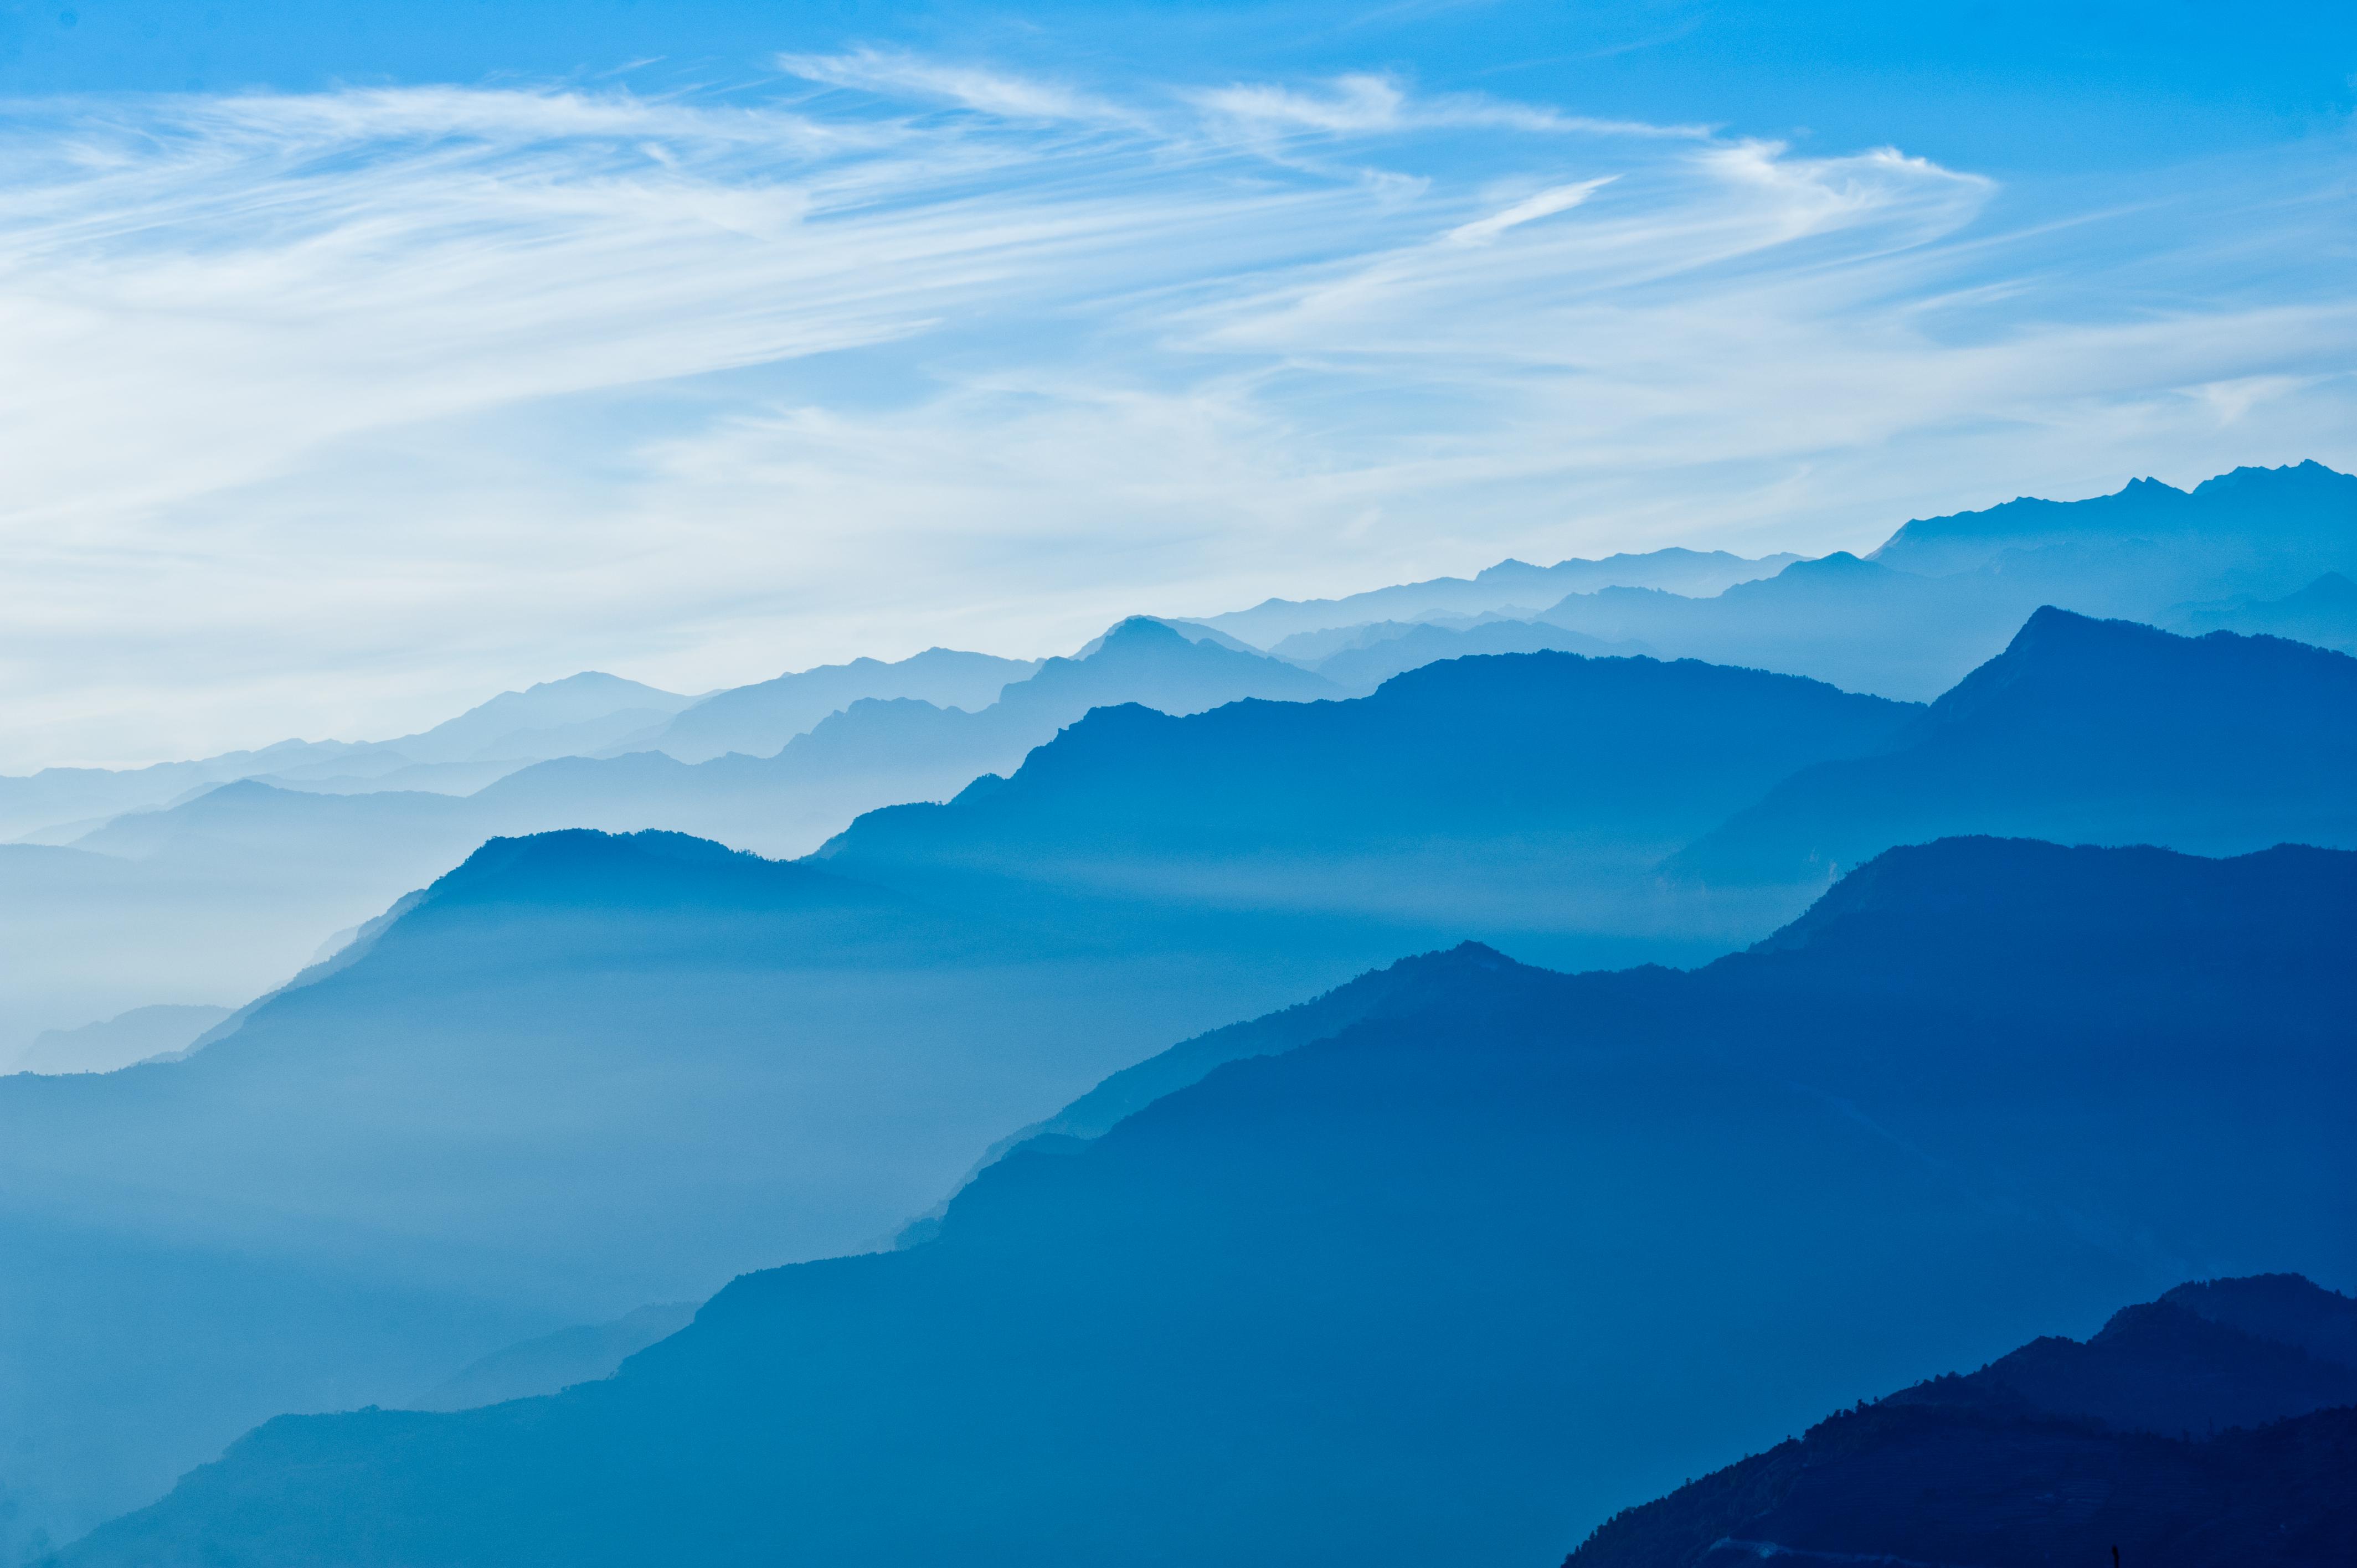 облака над горами бесплатно